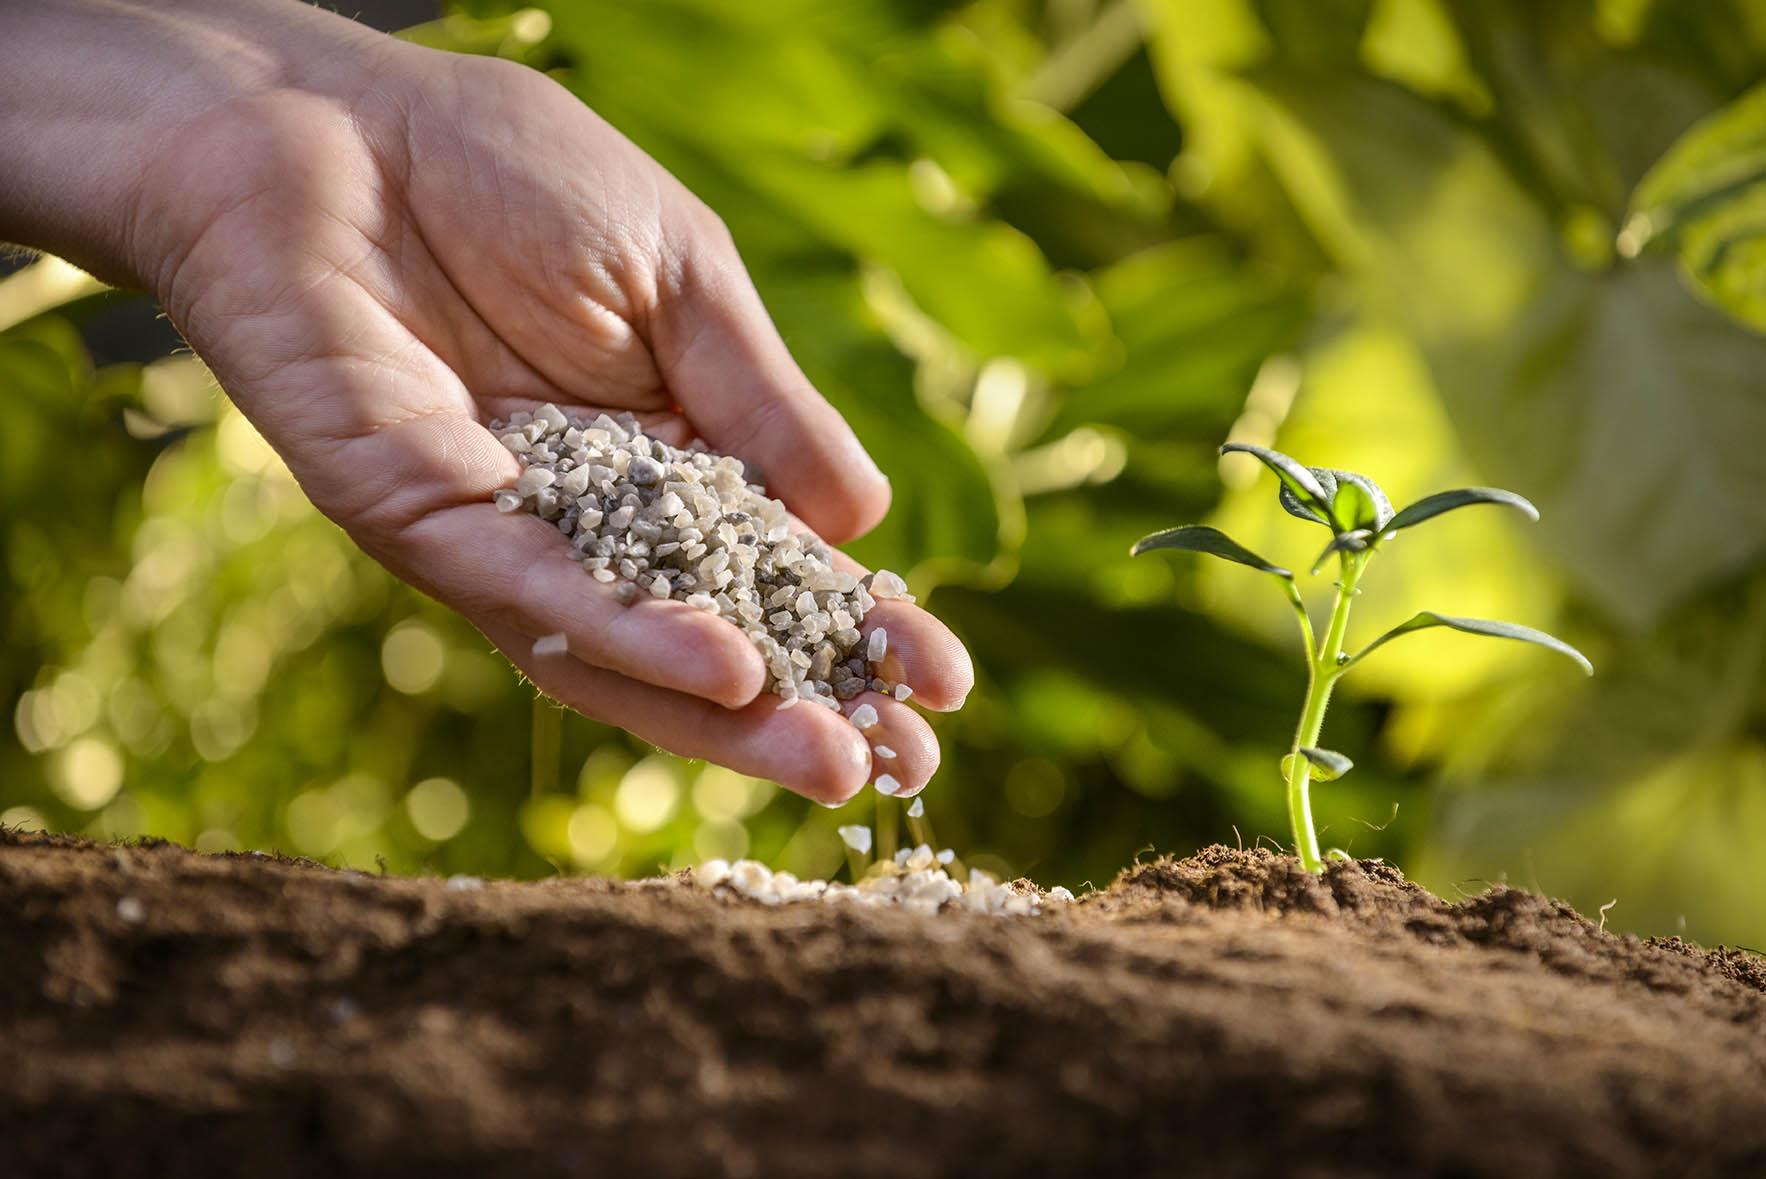 Introducing a New Multi-Nutrient Fertilizer - Polysulphate - CropLife